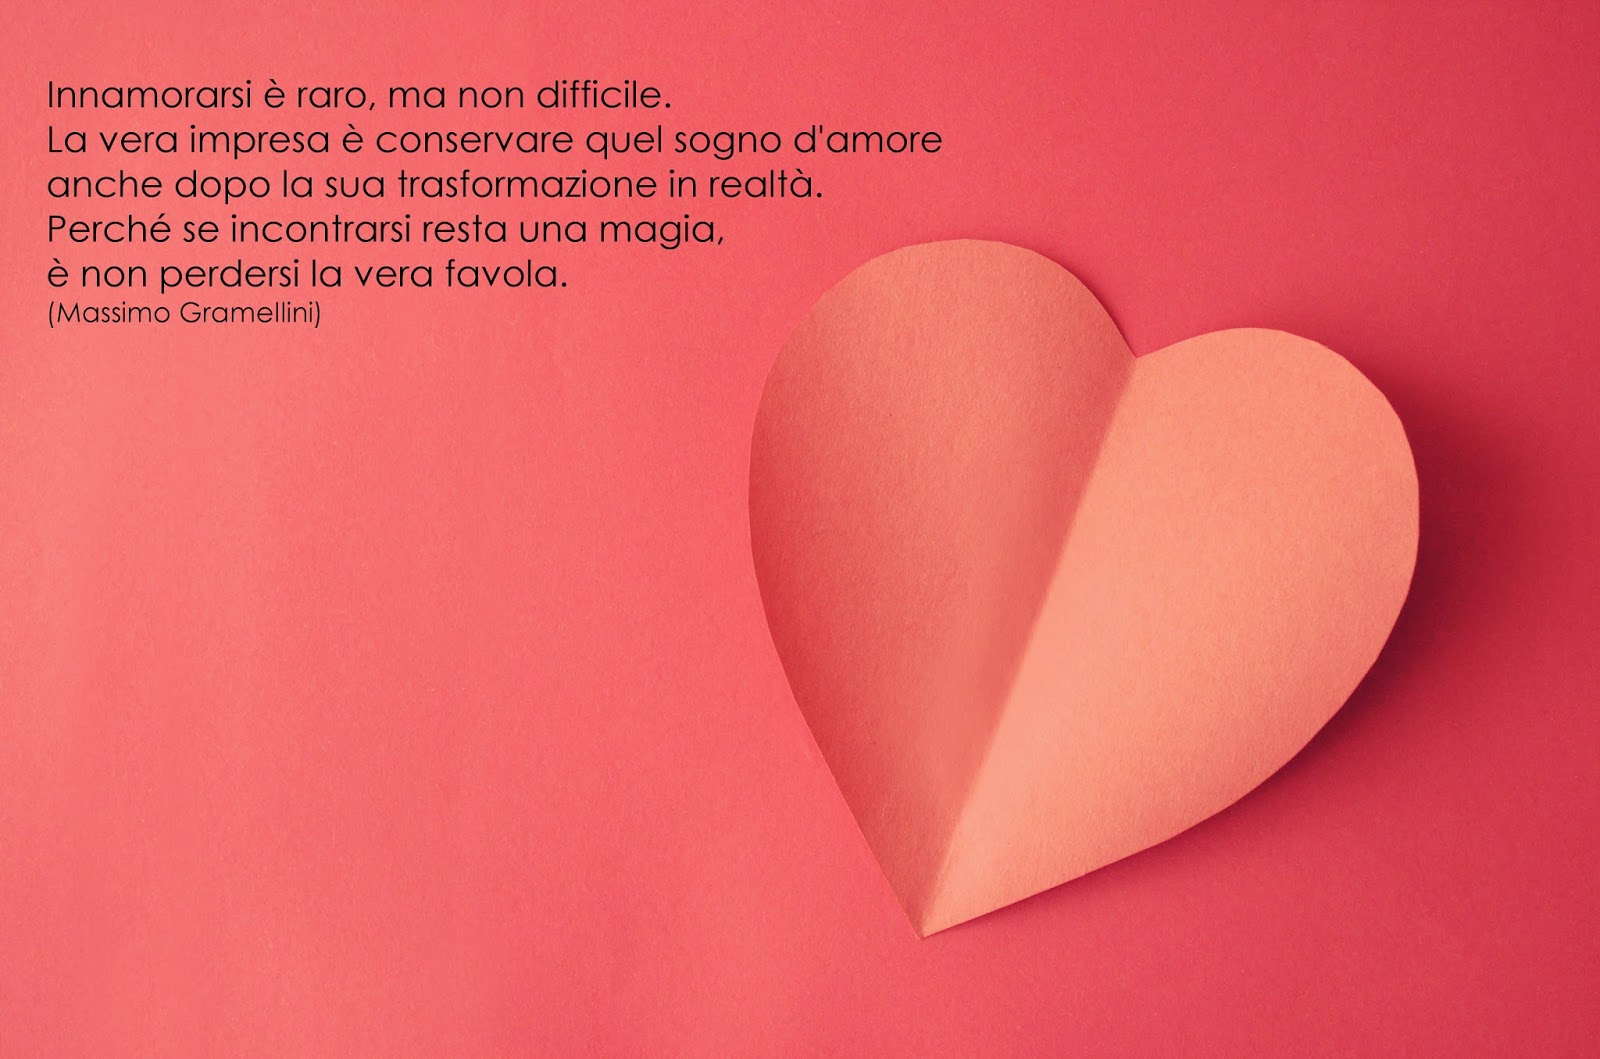 Frasi Matrimonio Gramellini.Amore Frasi Anniversario Matrimonio